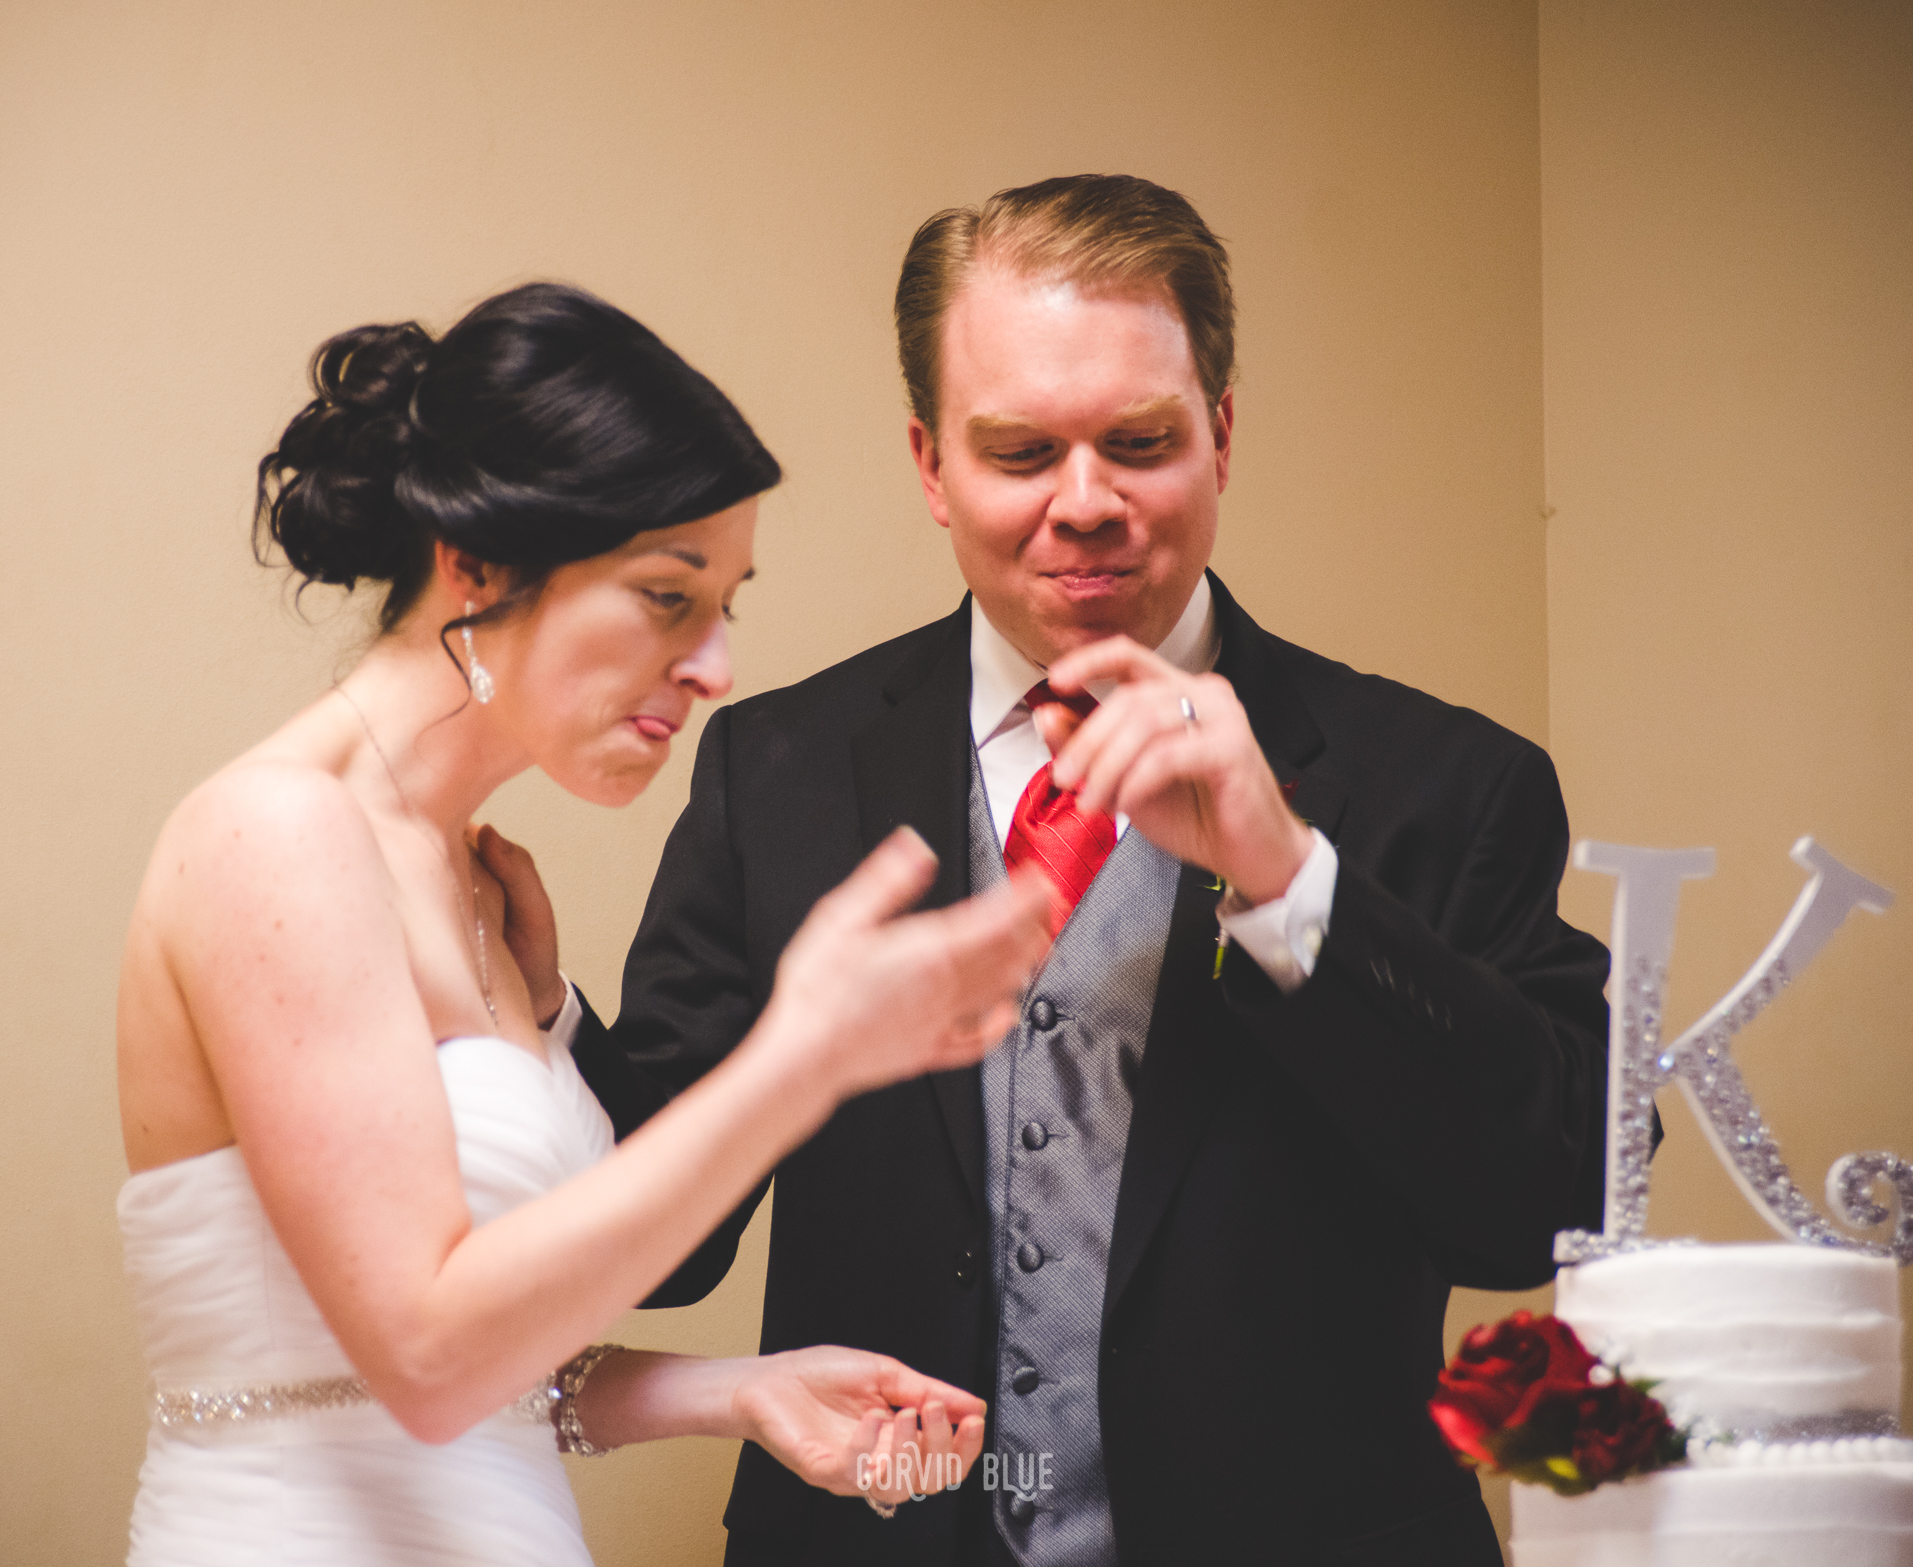 Kirk wedding-394.jpg